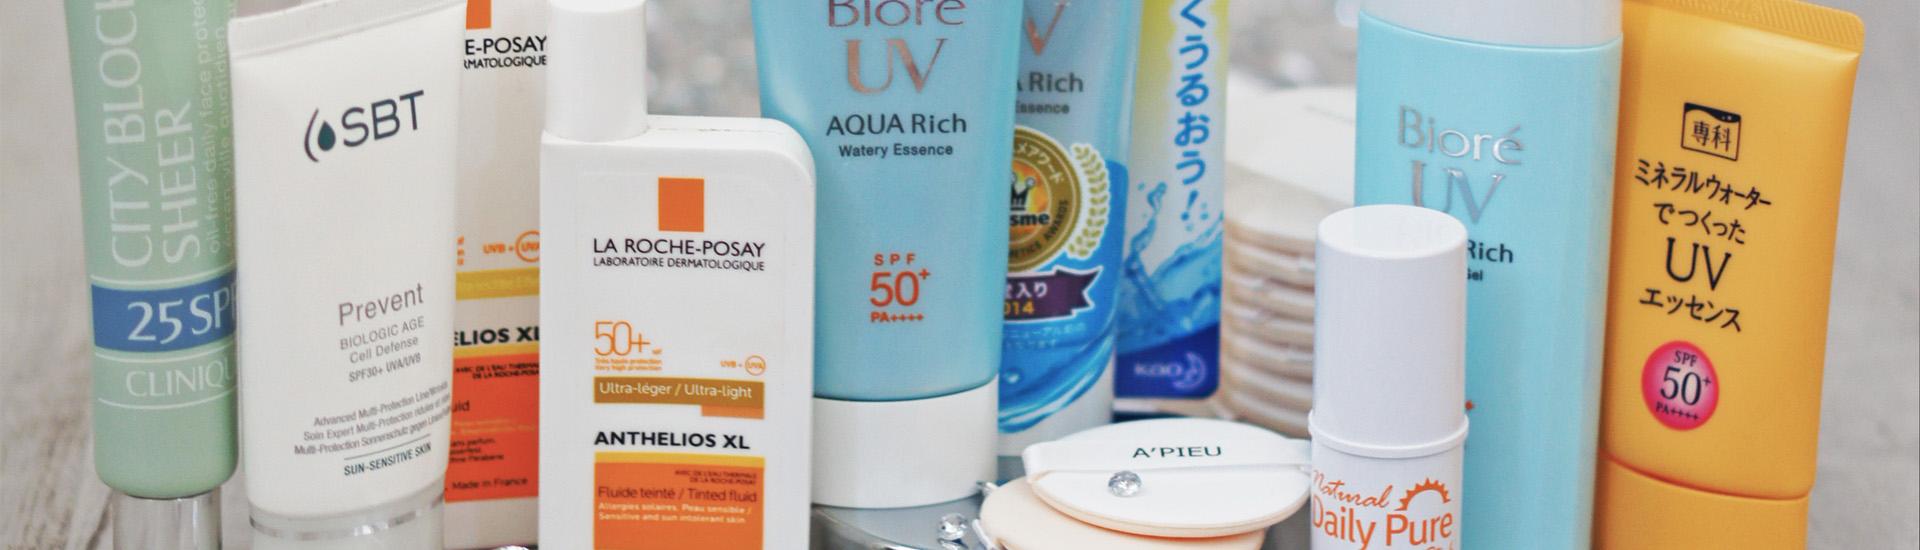 Sunscreens